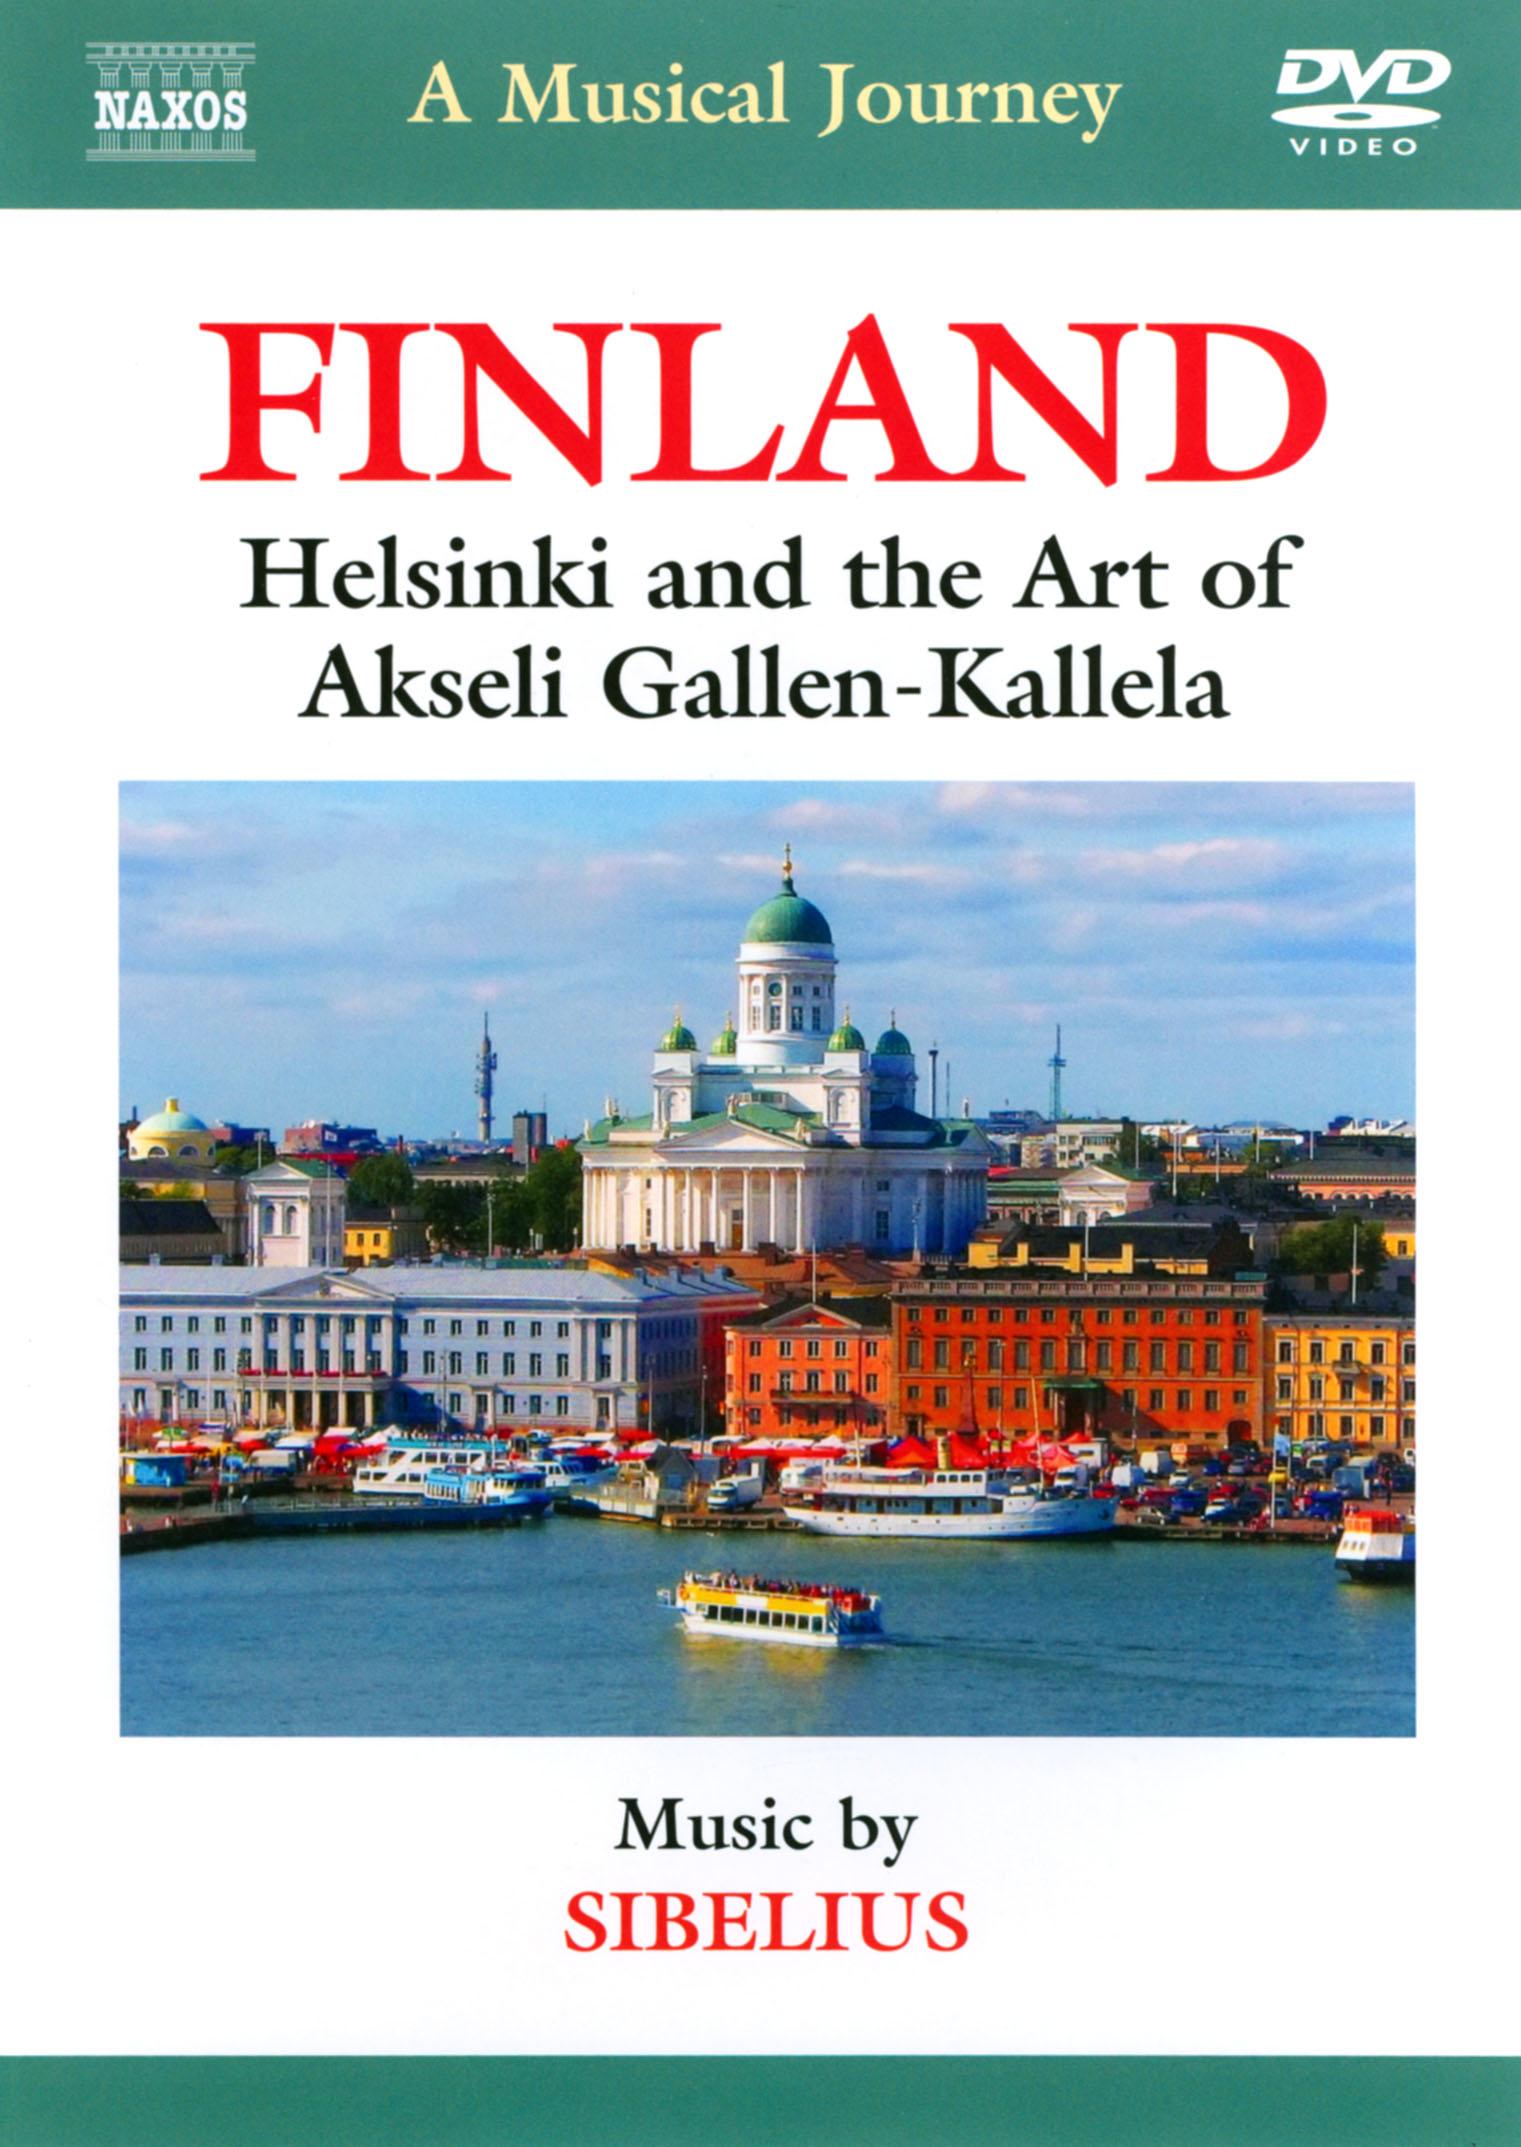 A Musical Journey: Finland - Helsinki and the Art of Akseli Gallen-Kallela